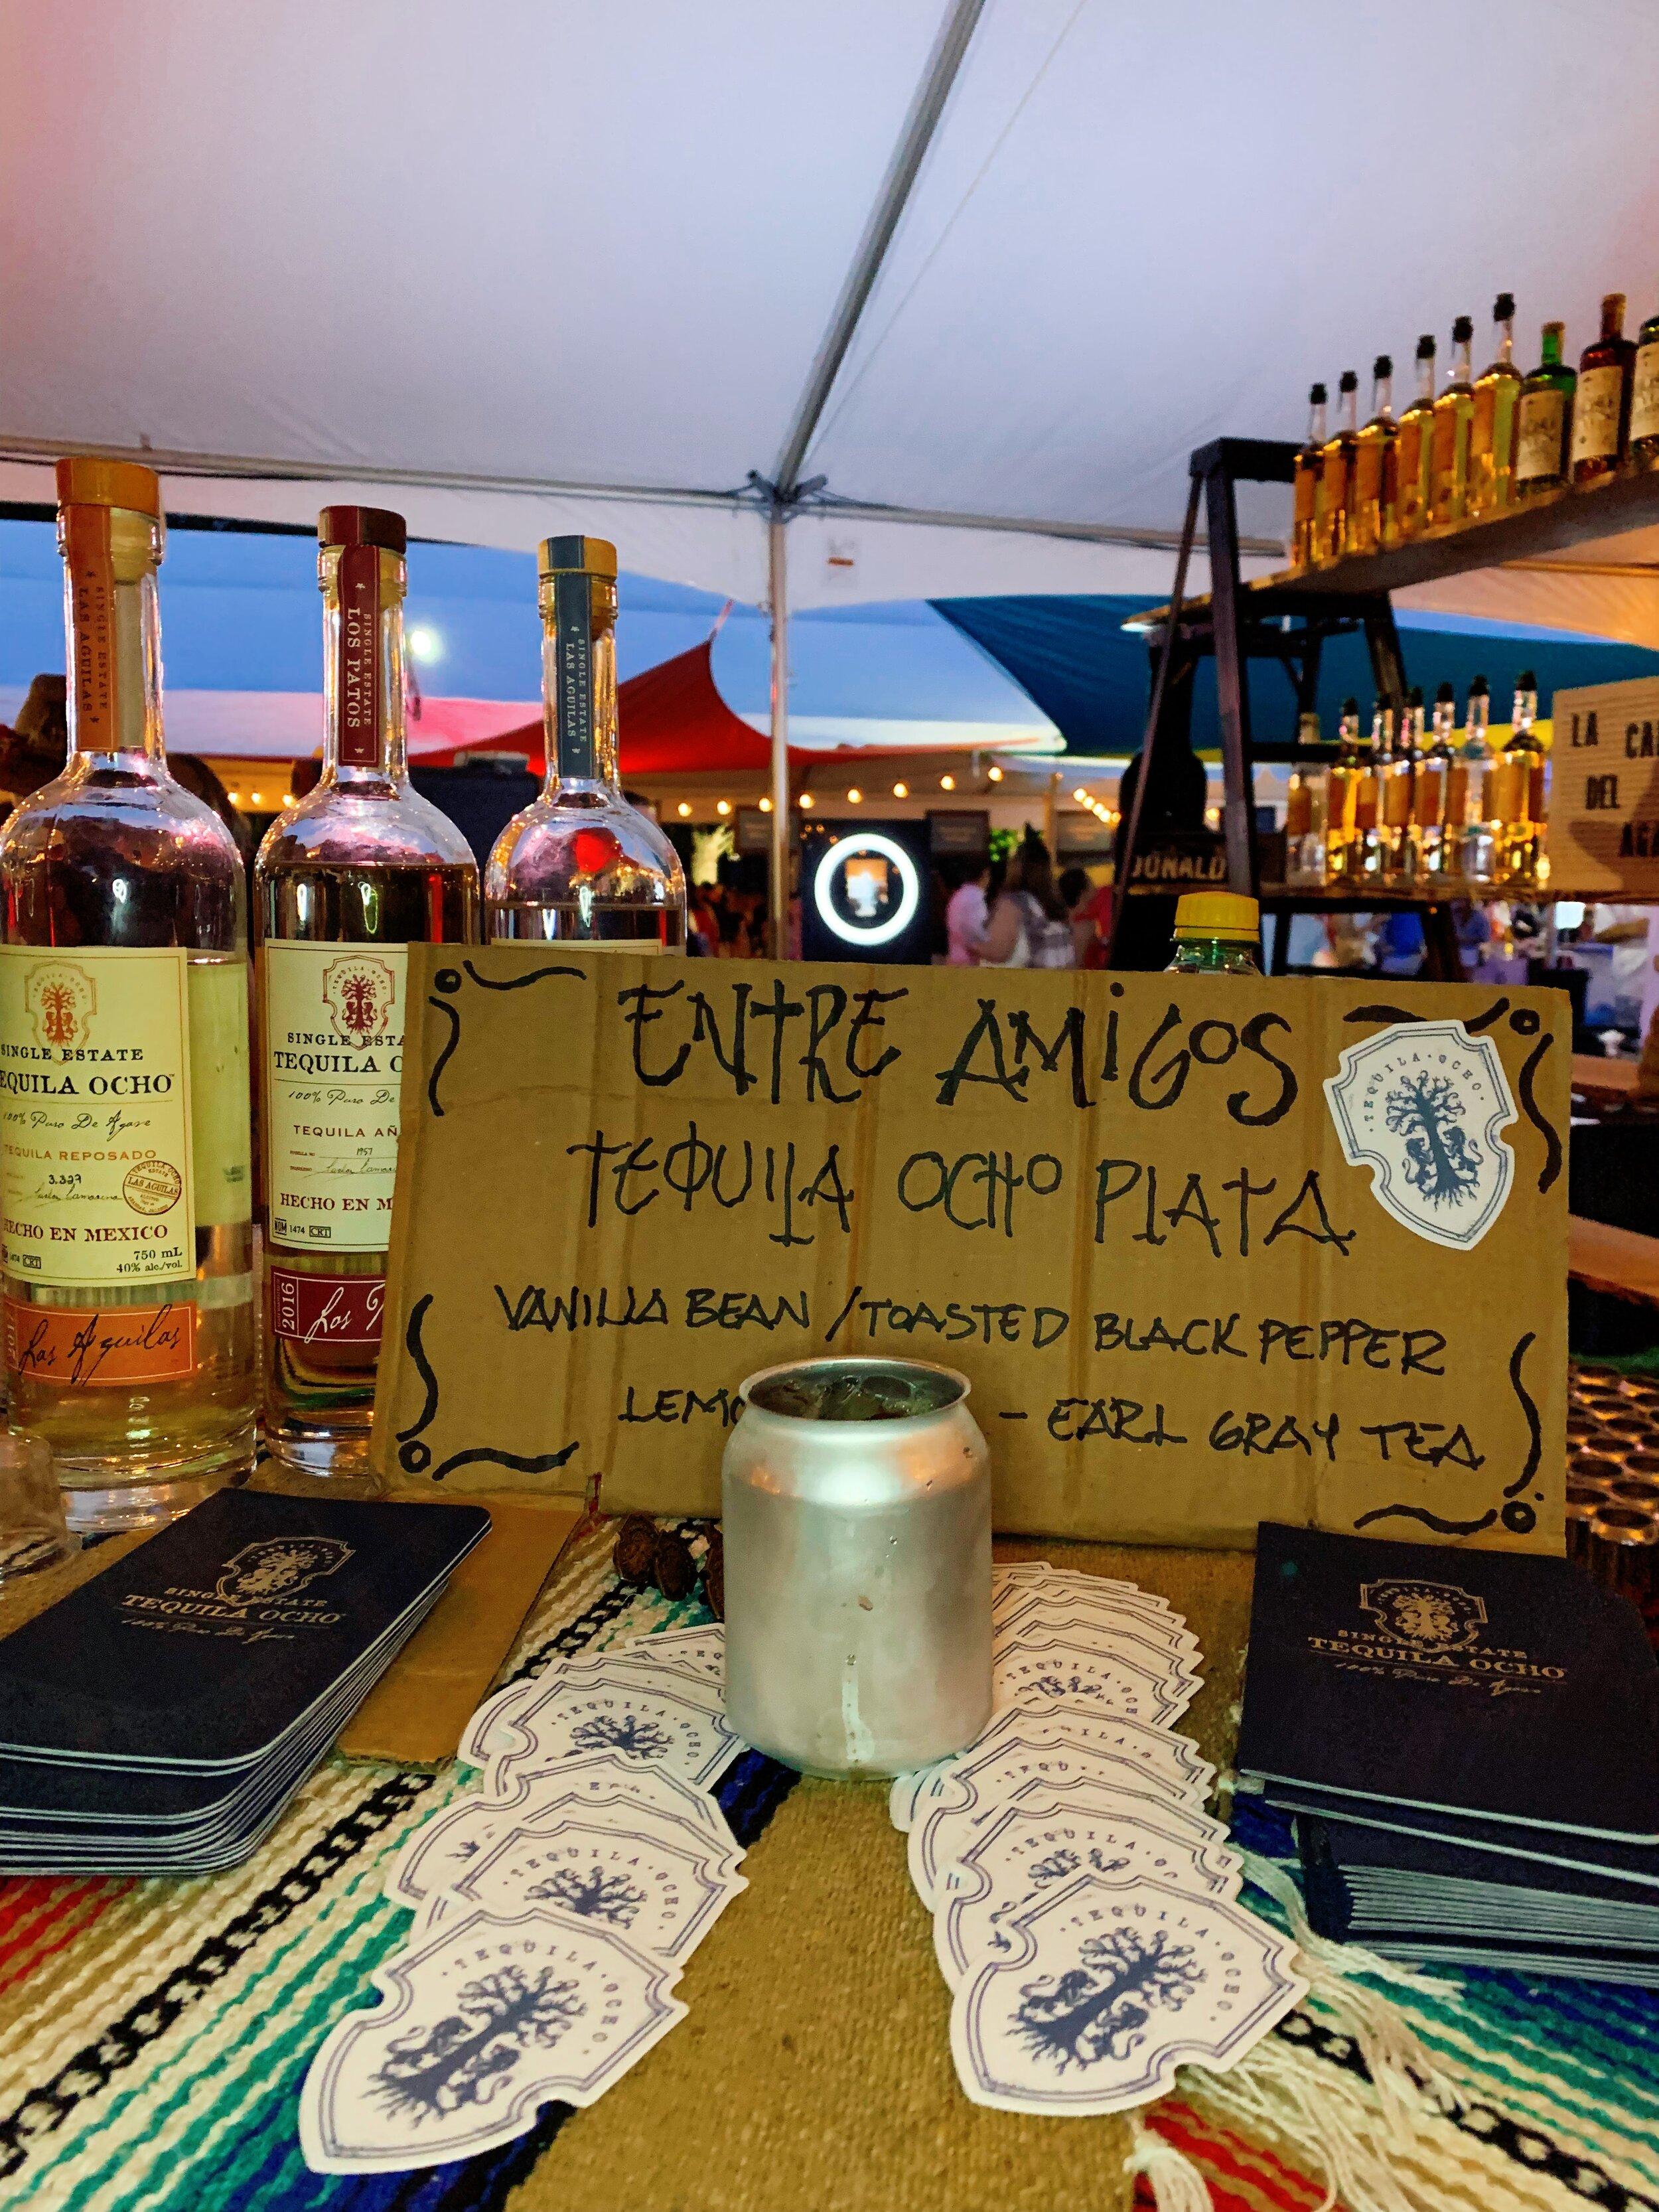 Entre Amigos | Tequila Ocho Plata + Vanilla Bean + Toasted Black Pepper + Lemon + Earl Gray Tea